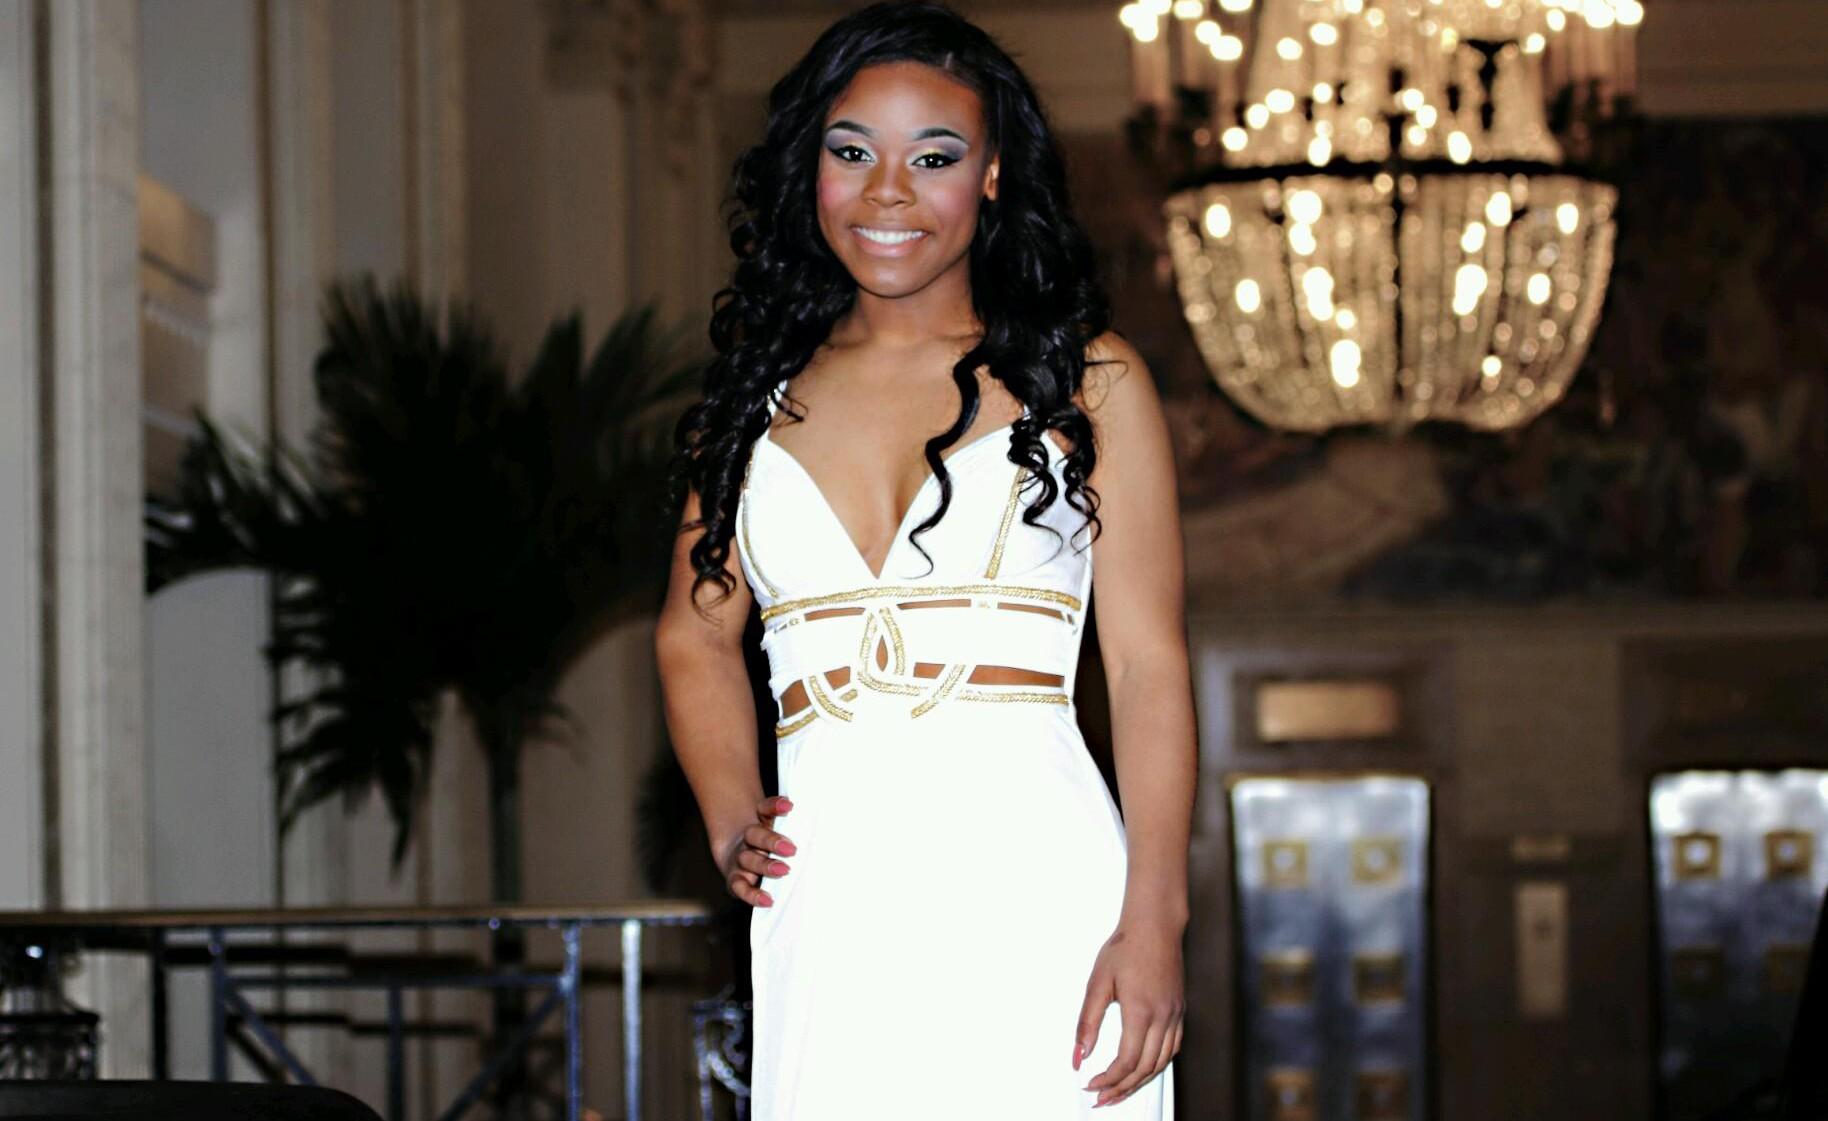 Miss teen illinois pageant - Xwetpics.com